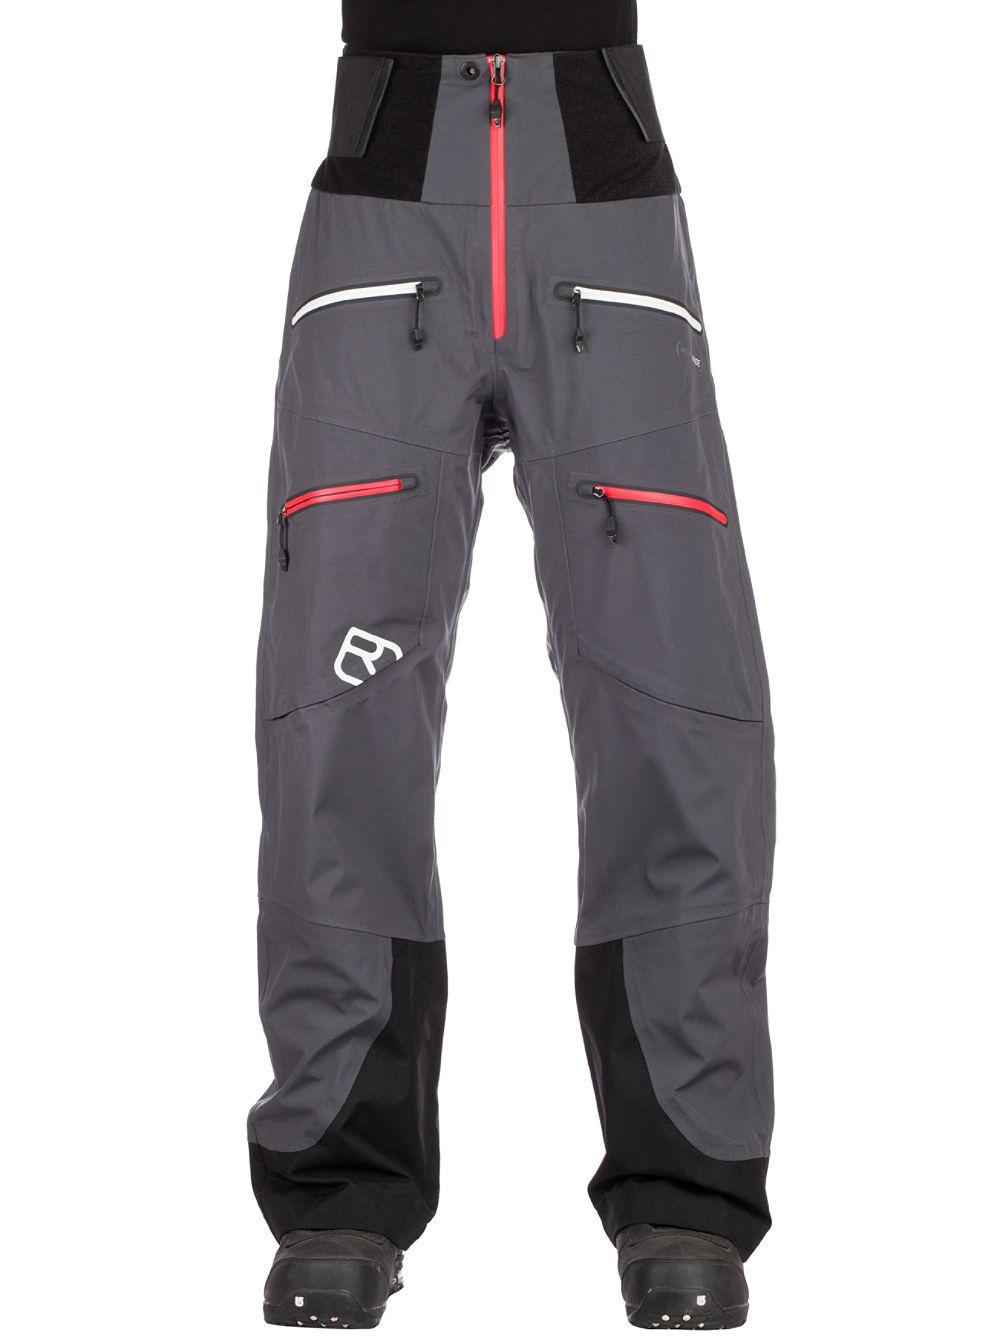 89d13d39 Køb Ortovox 3L Guardian Shell Pants online hos Blue Tomato